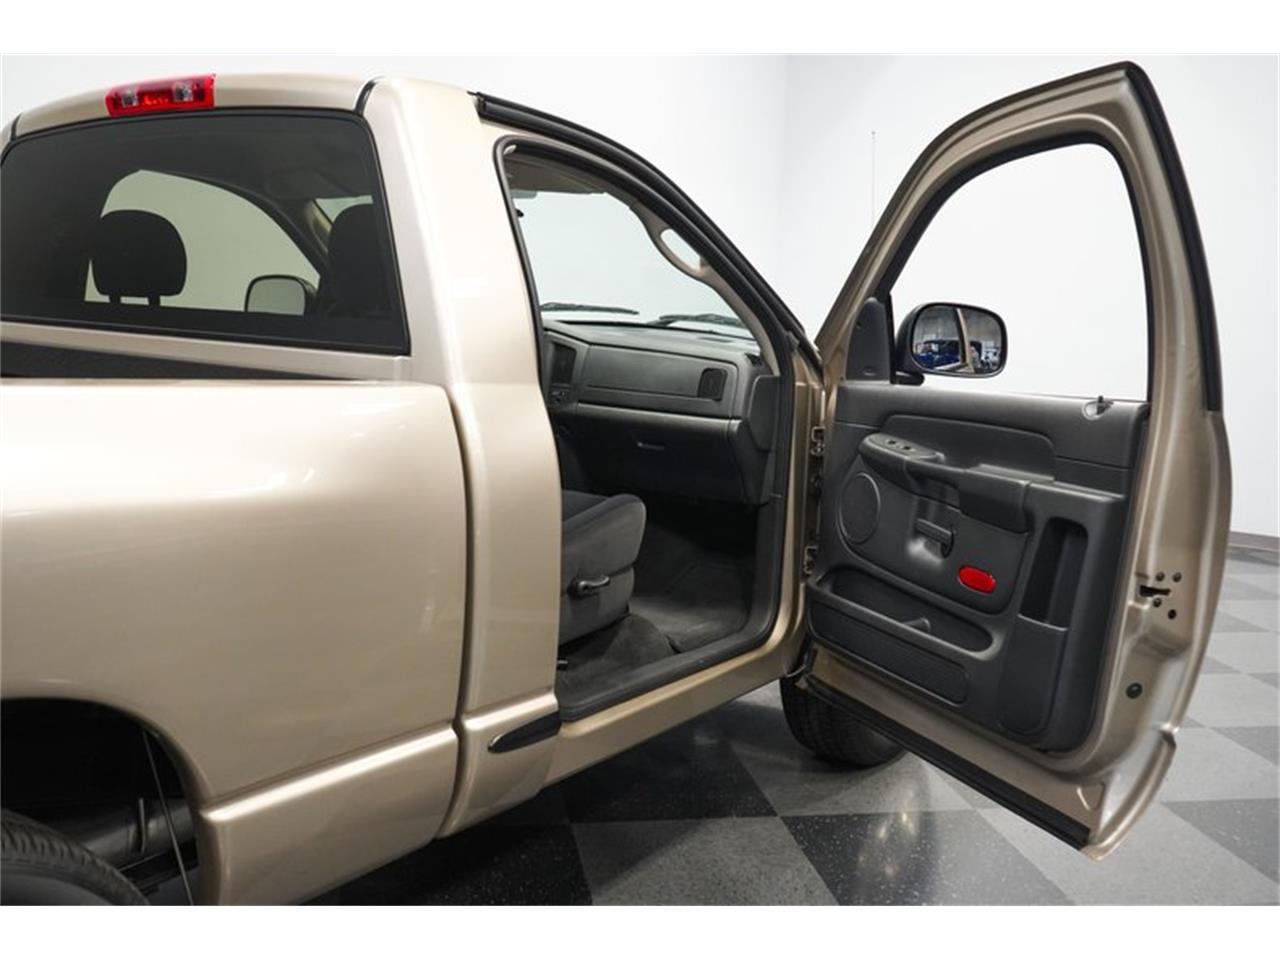 2005 Dodge Ram (CC-1419542) for sale in Mesa, Arizona